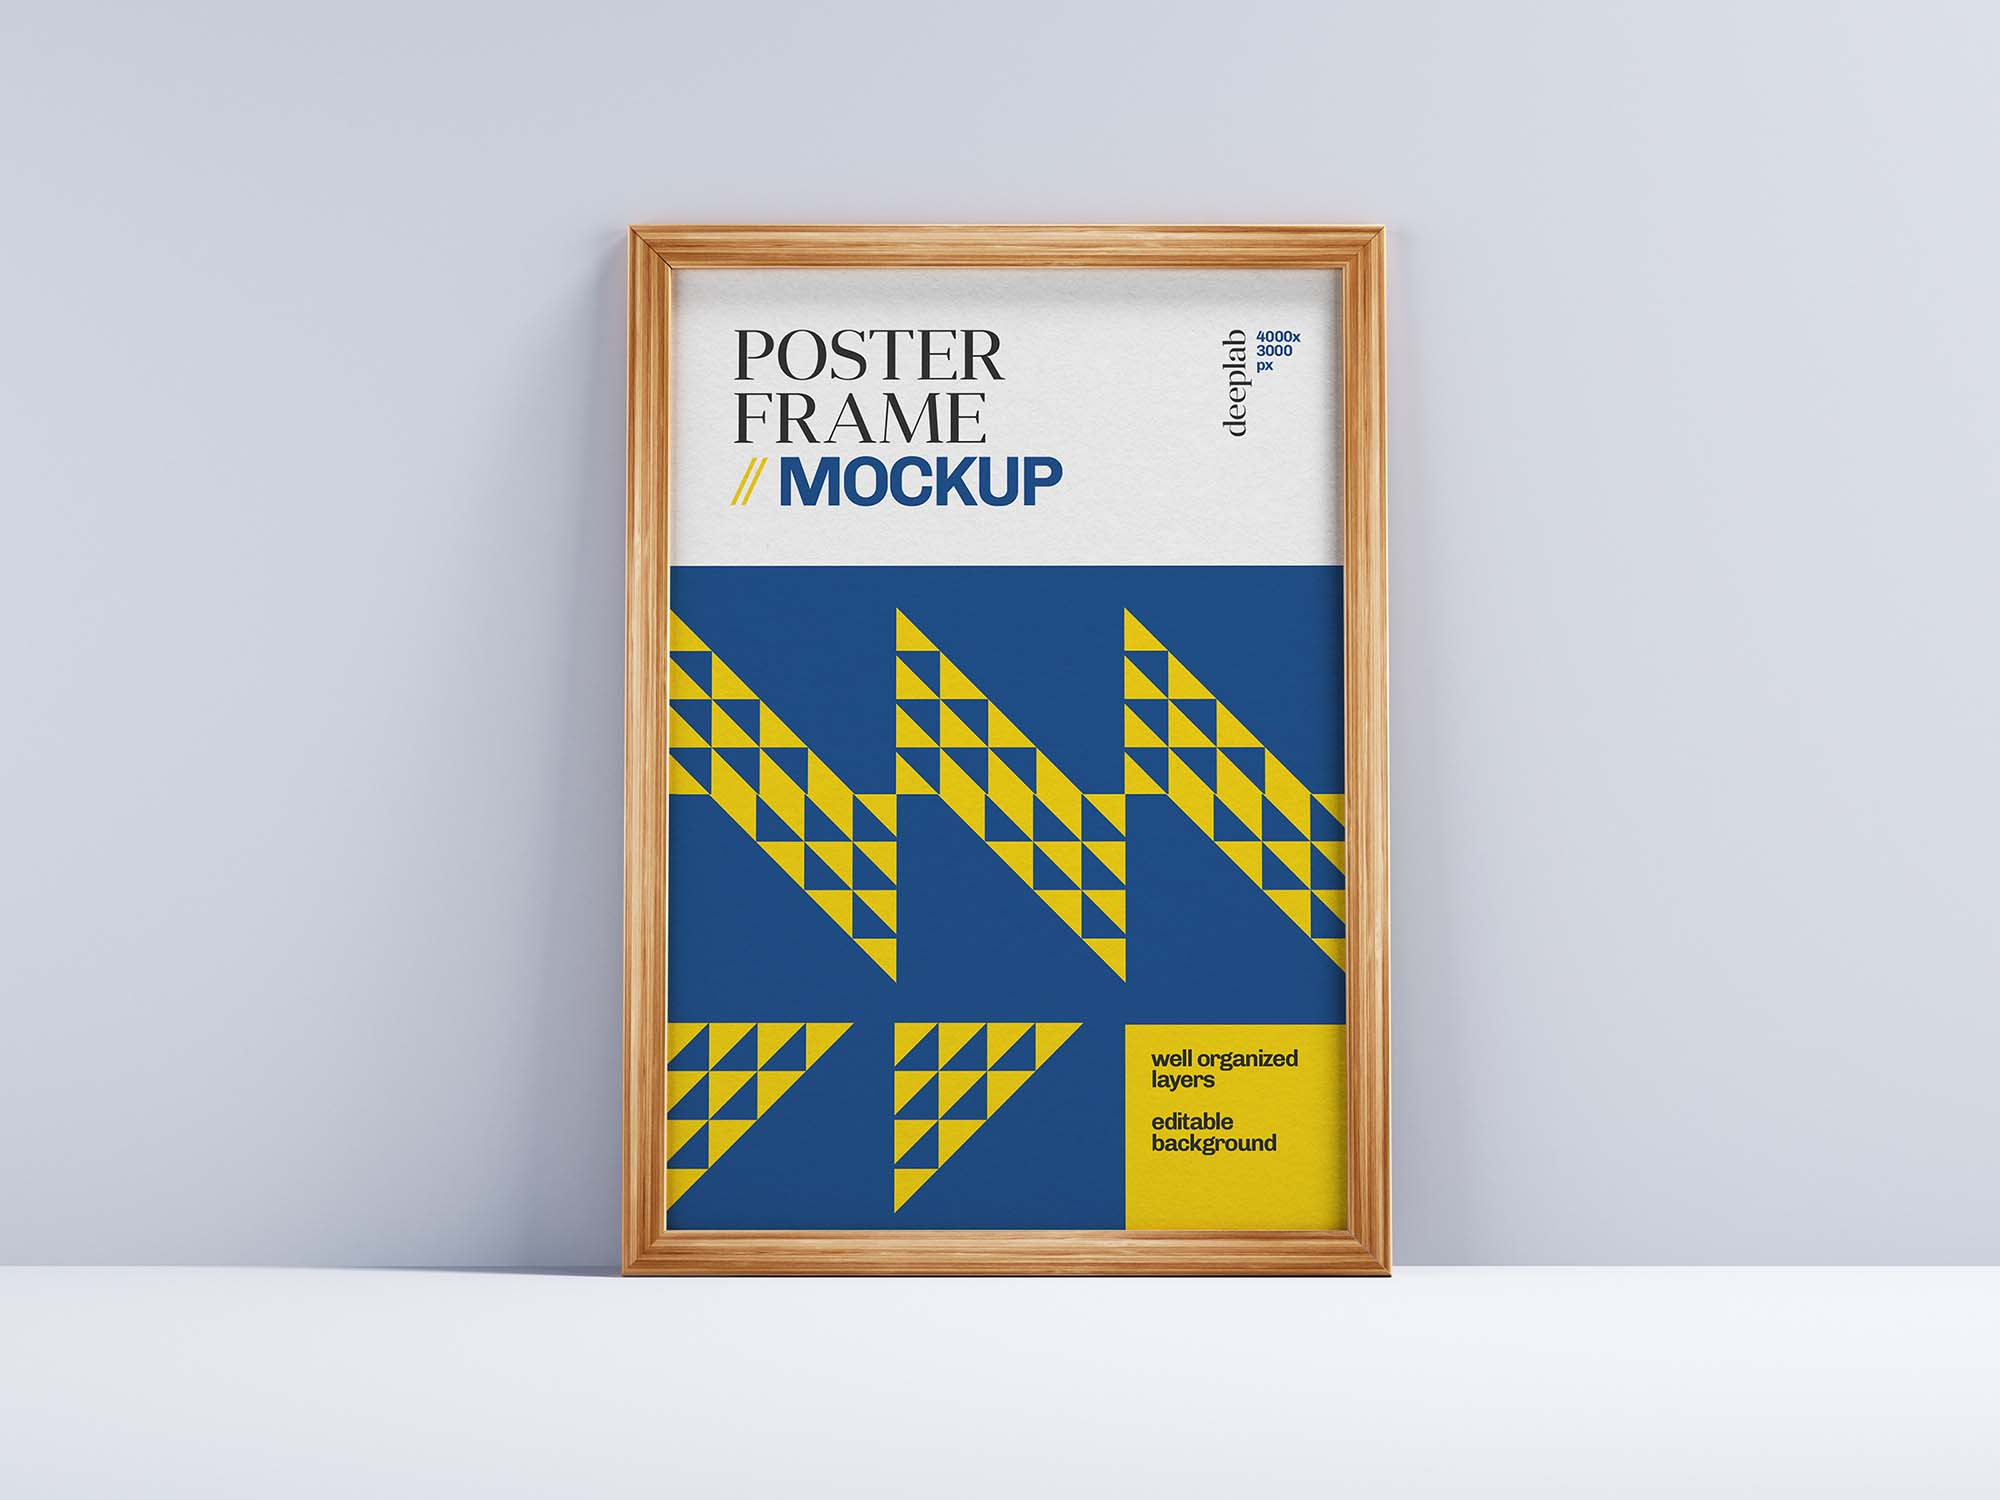 Realistic Wood Frame Poster Mockup 2